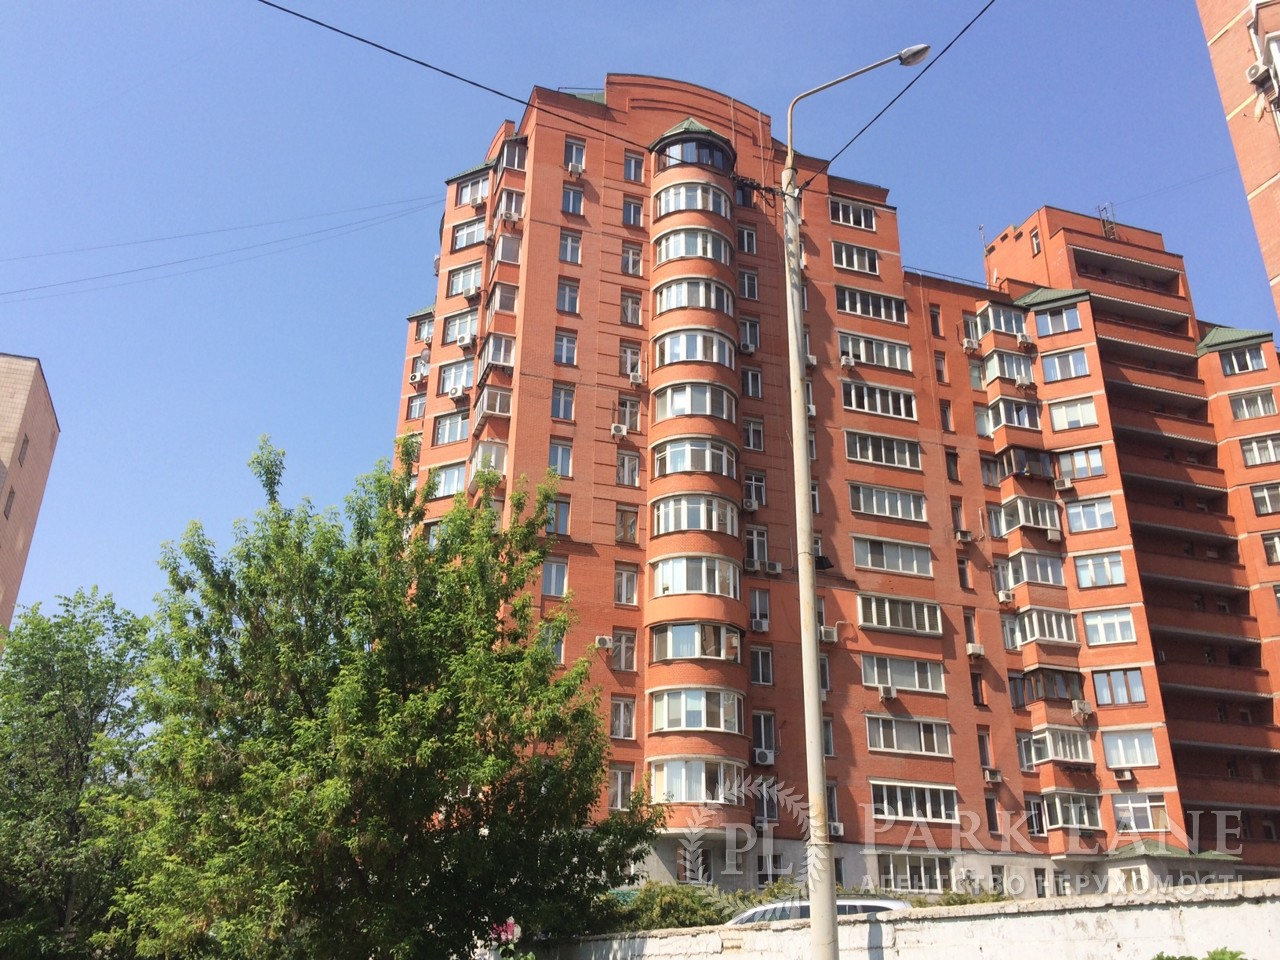 Квартира ул. Златоустовская, 10/12, Киев, Z-1417441 - Фото 1